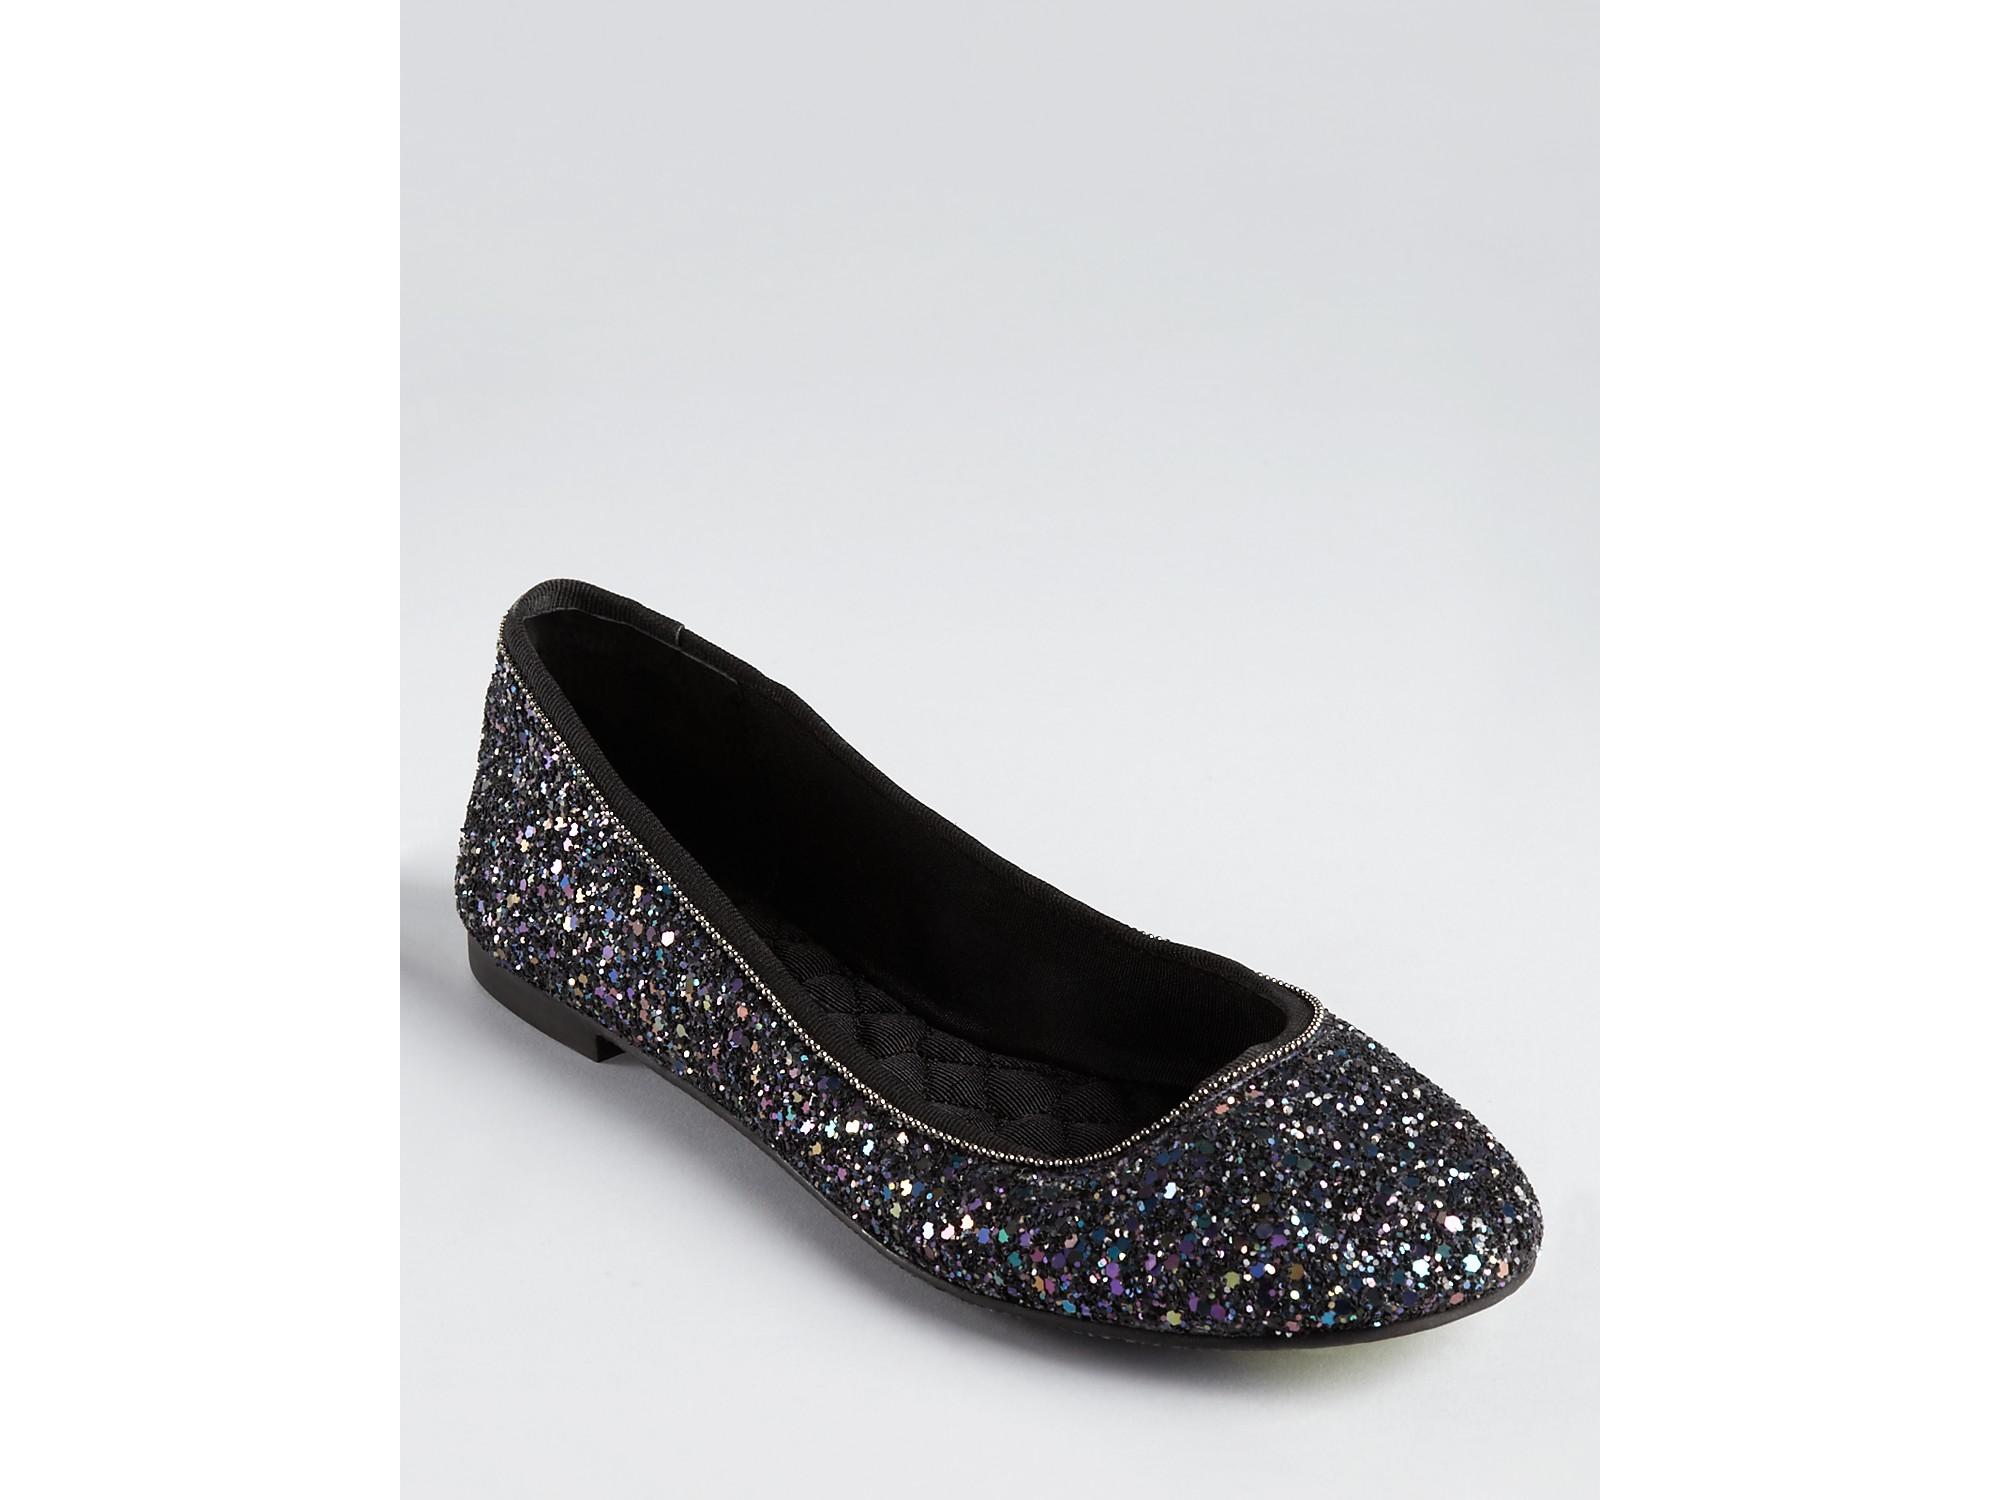 Boutique 9 Flats Aldenia3 Glitter in Black | Lyst